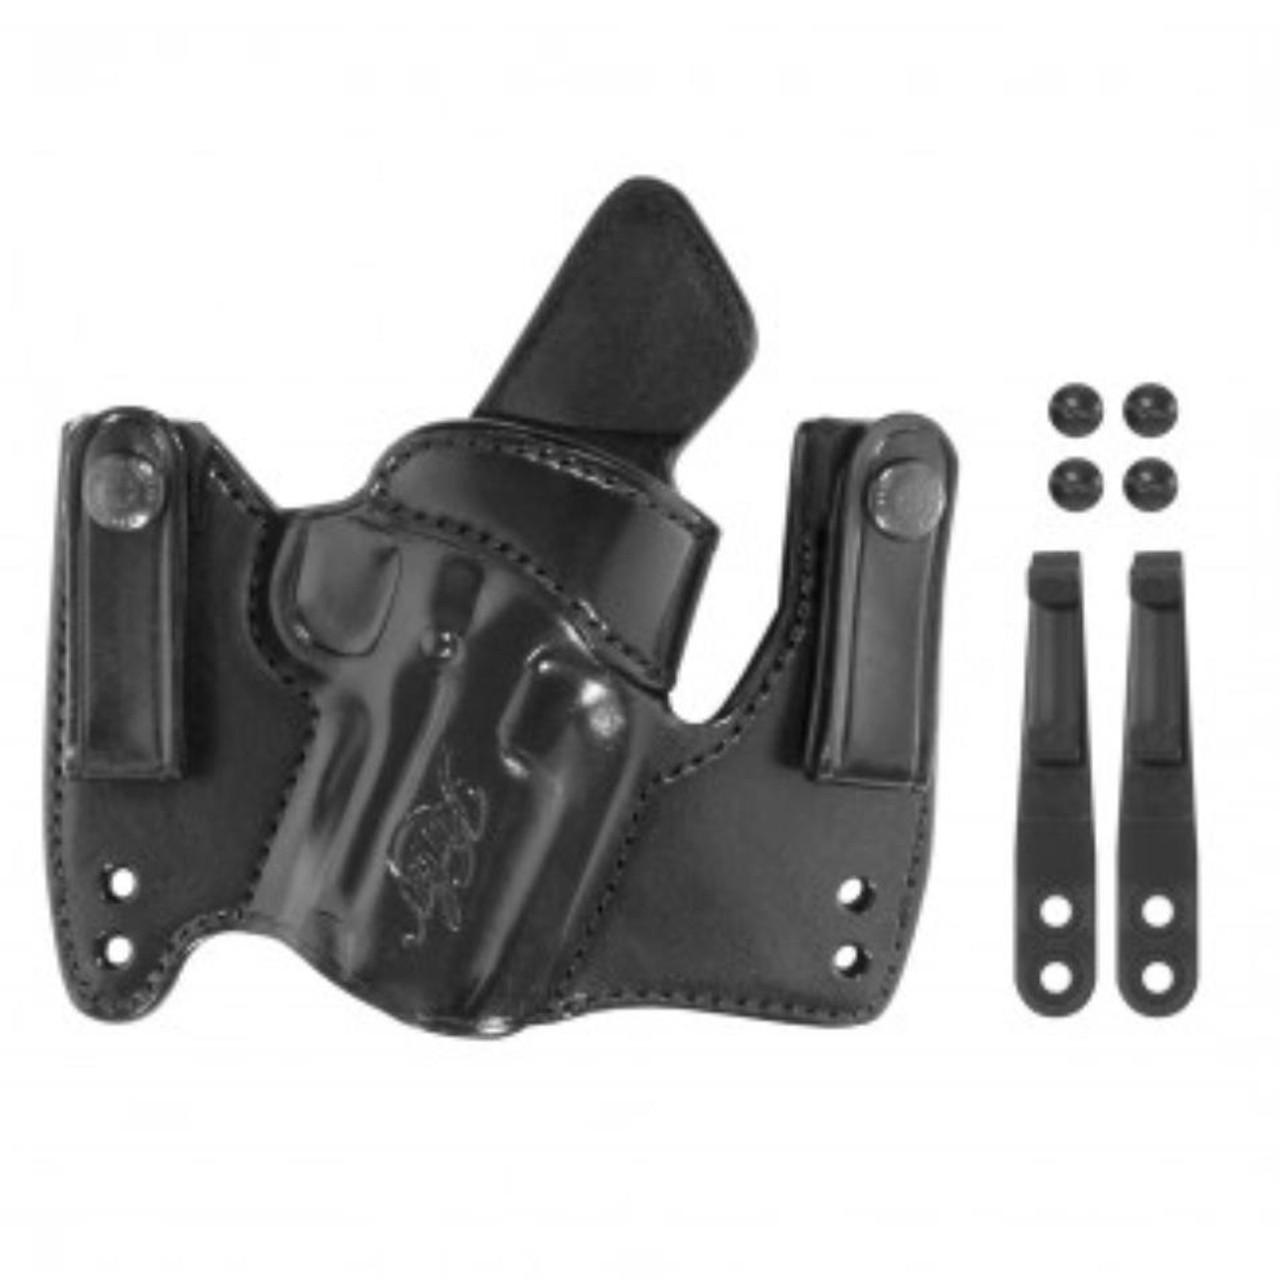 Kimber V-Hawk inside-the-waistband holster for Ultra-size (3-inch